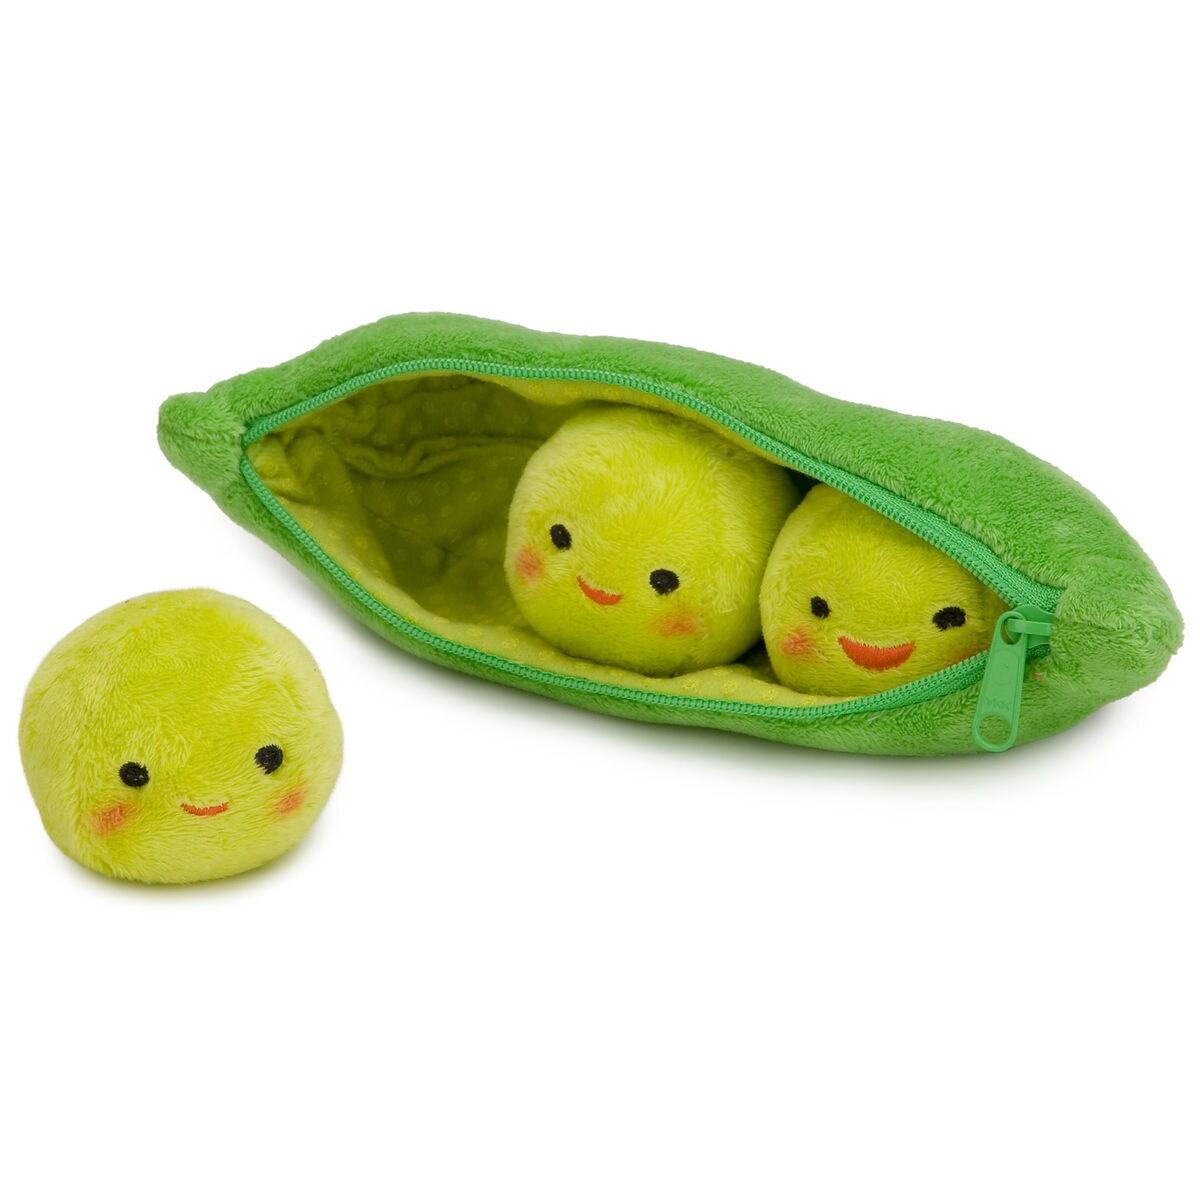 3 Peas In A Pod Plush Toy Story 3 Mini Bean Bag 8 Shopdisney